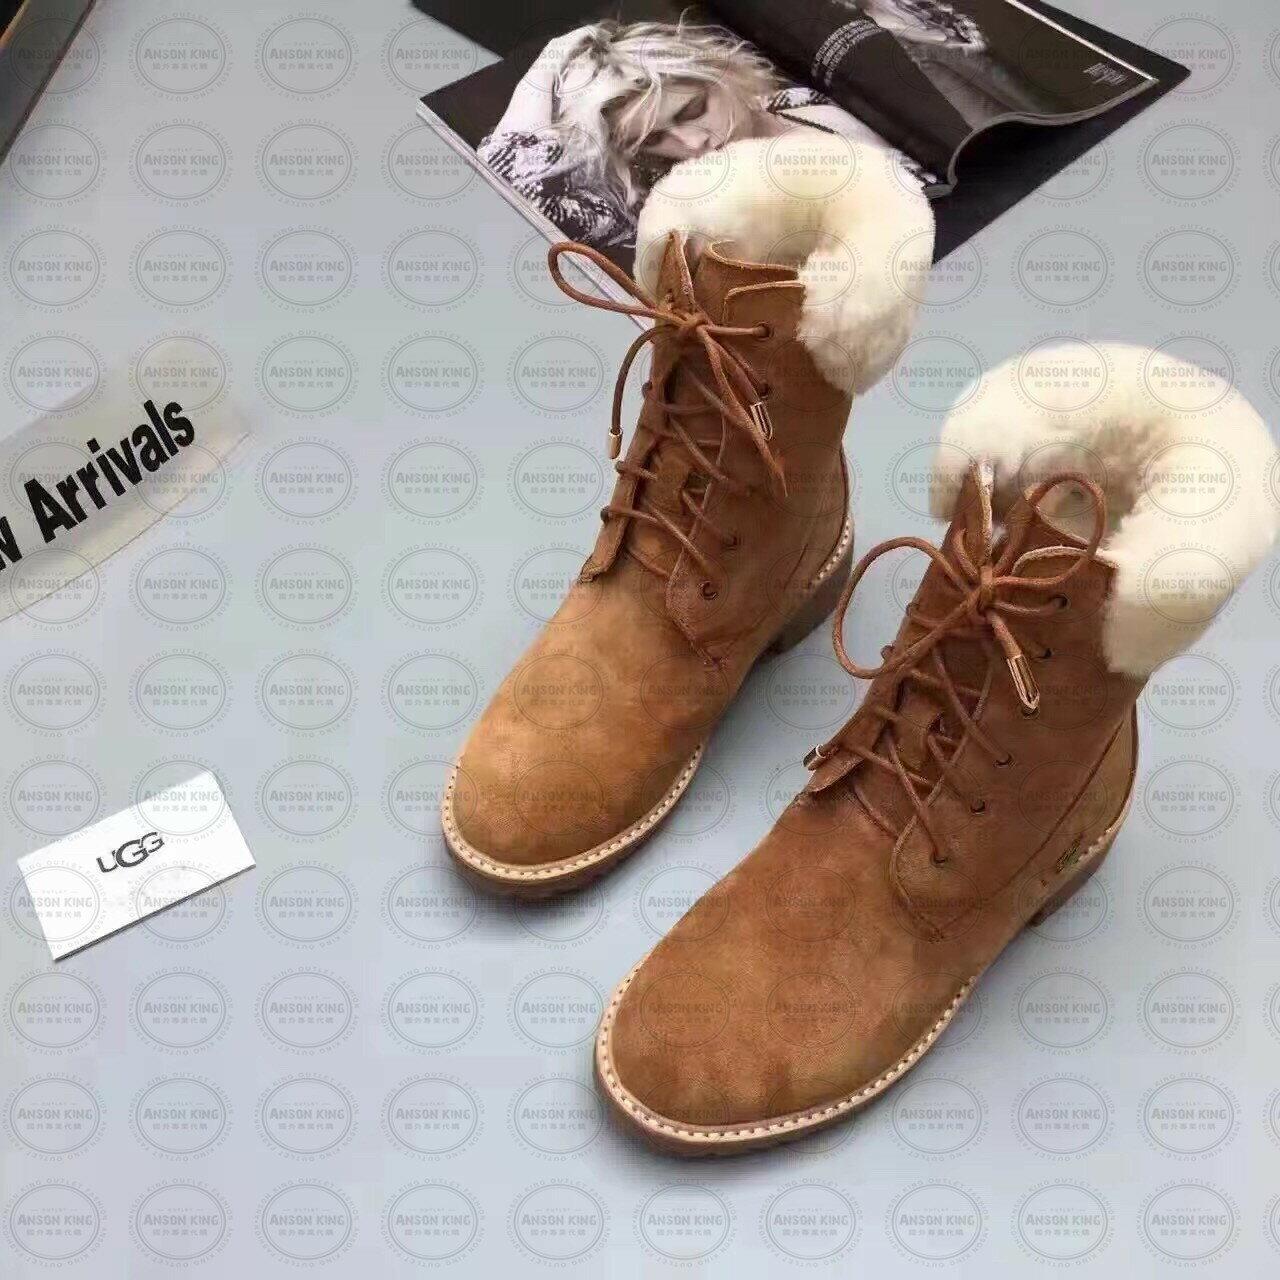 OUTLET正品代購 澳洲 UGG 女款經典復古翻毛 馬汀靴 中長靴 保暖 真皮羊皮毛 雪靴 短靴 棕色 0